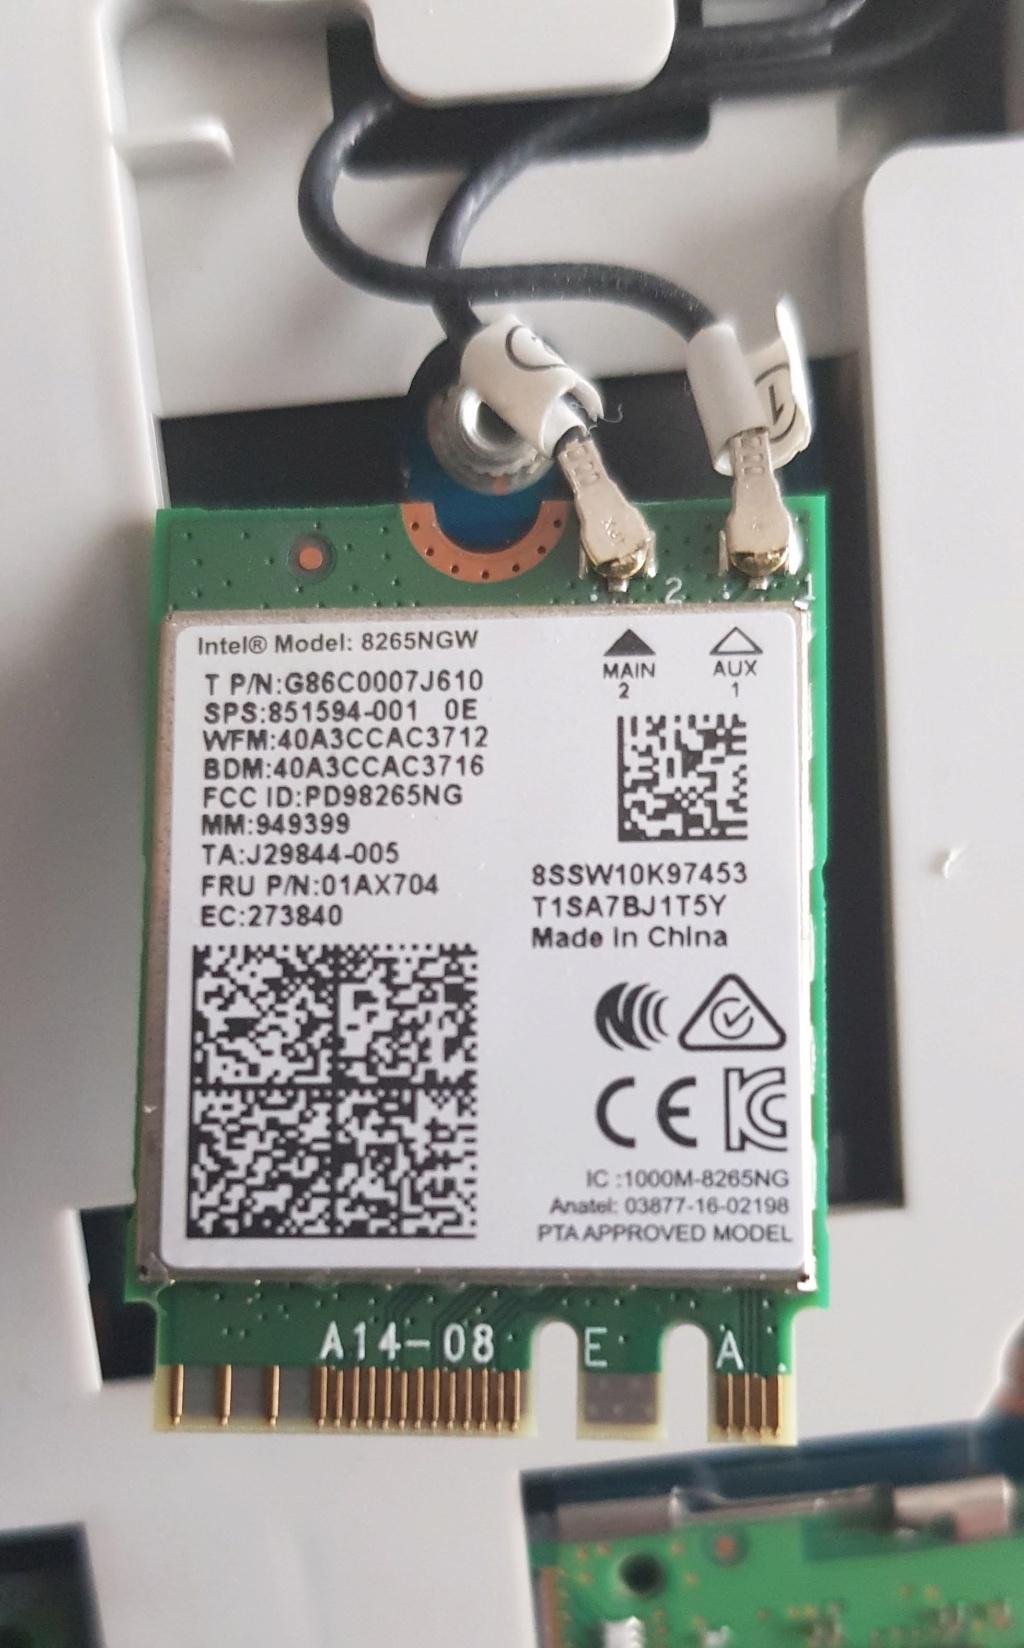 HP ProBook 470 G5 Core i7 8550U - Page 2 20191025